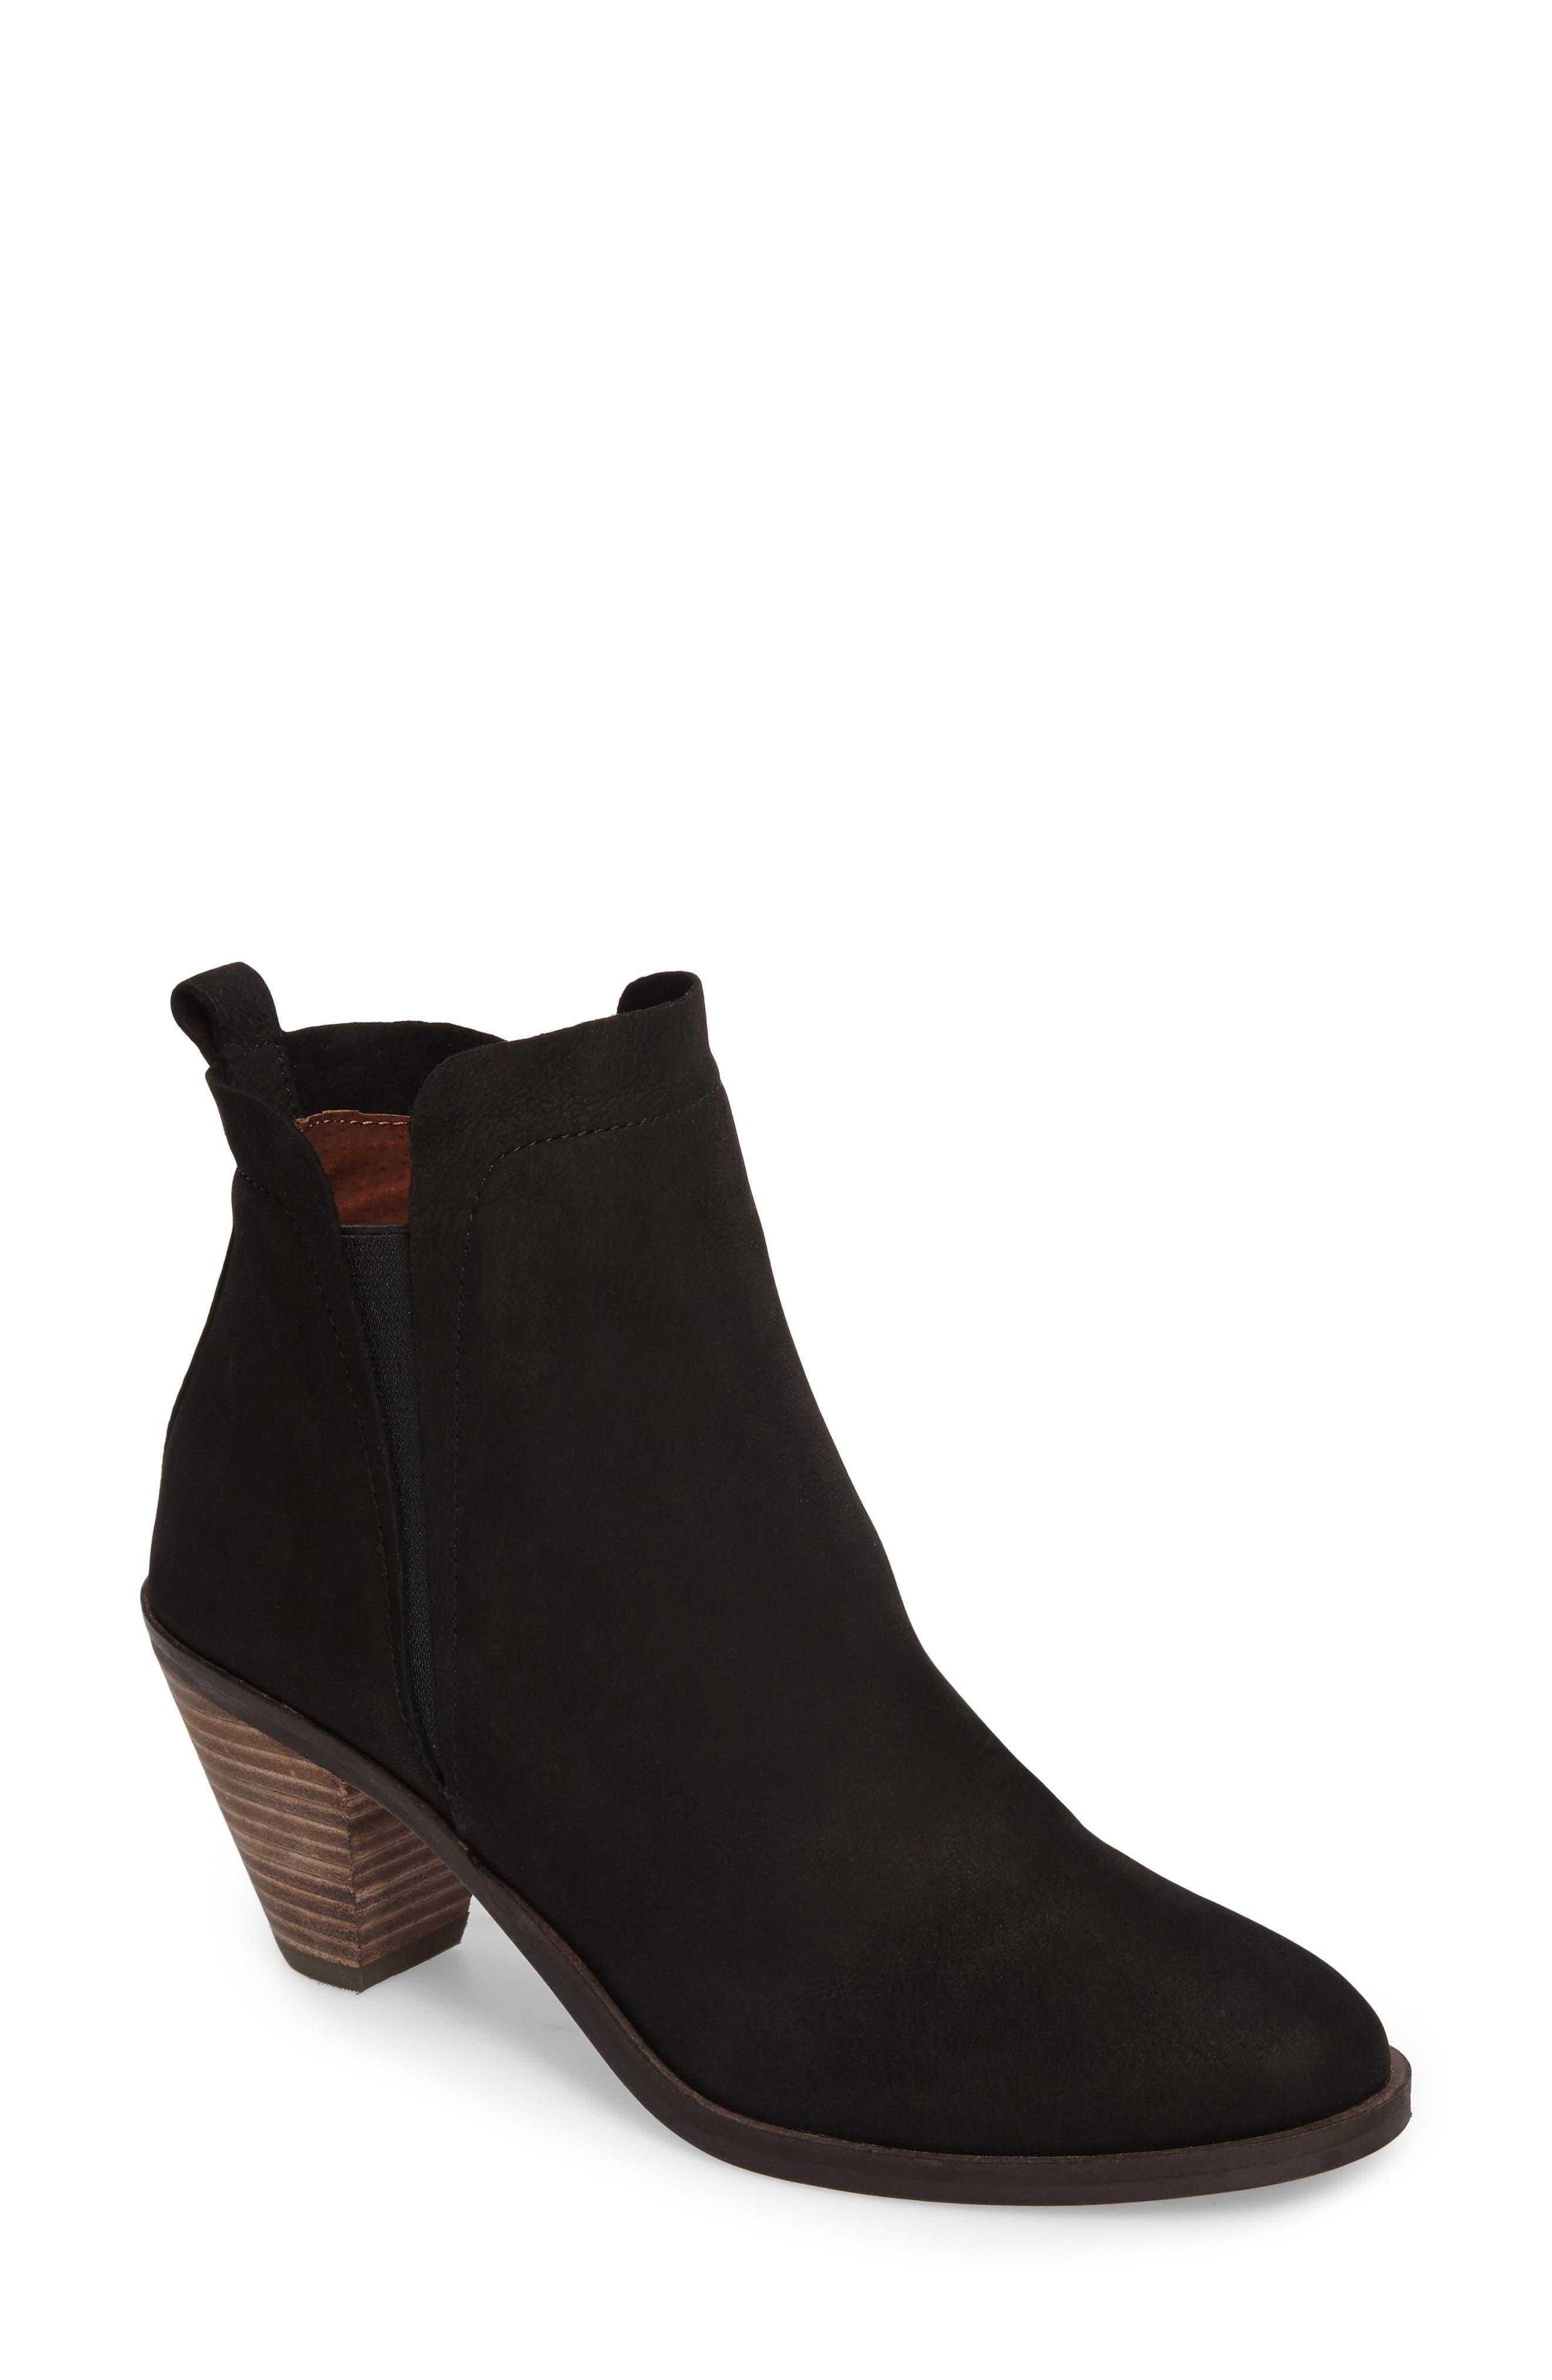 Jana Bootie,                             Main thumbnail 1, color,                             Black Leather